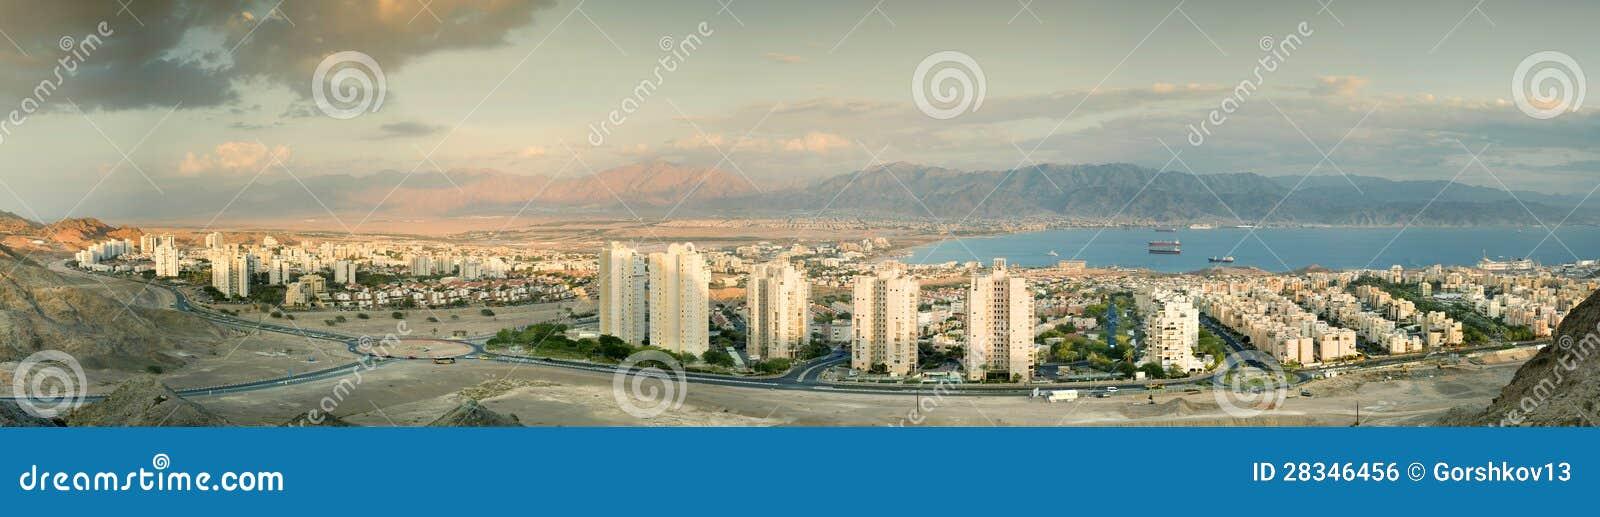 Panoramiczny widok na Eilat i Aqaba